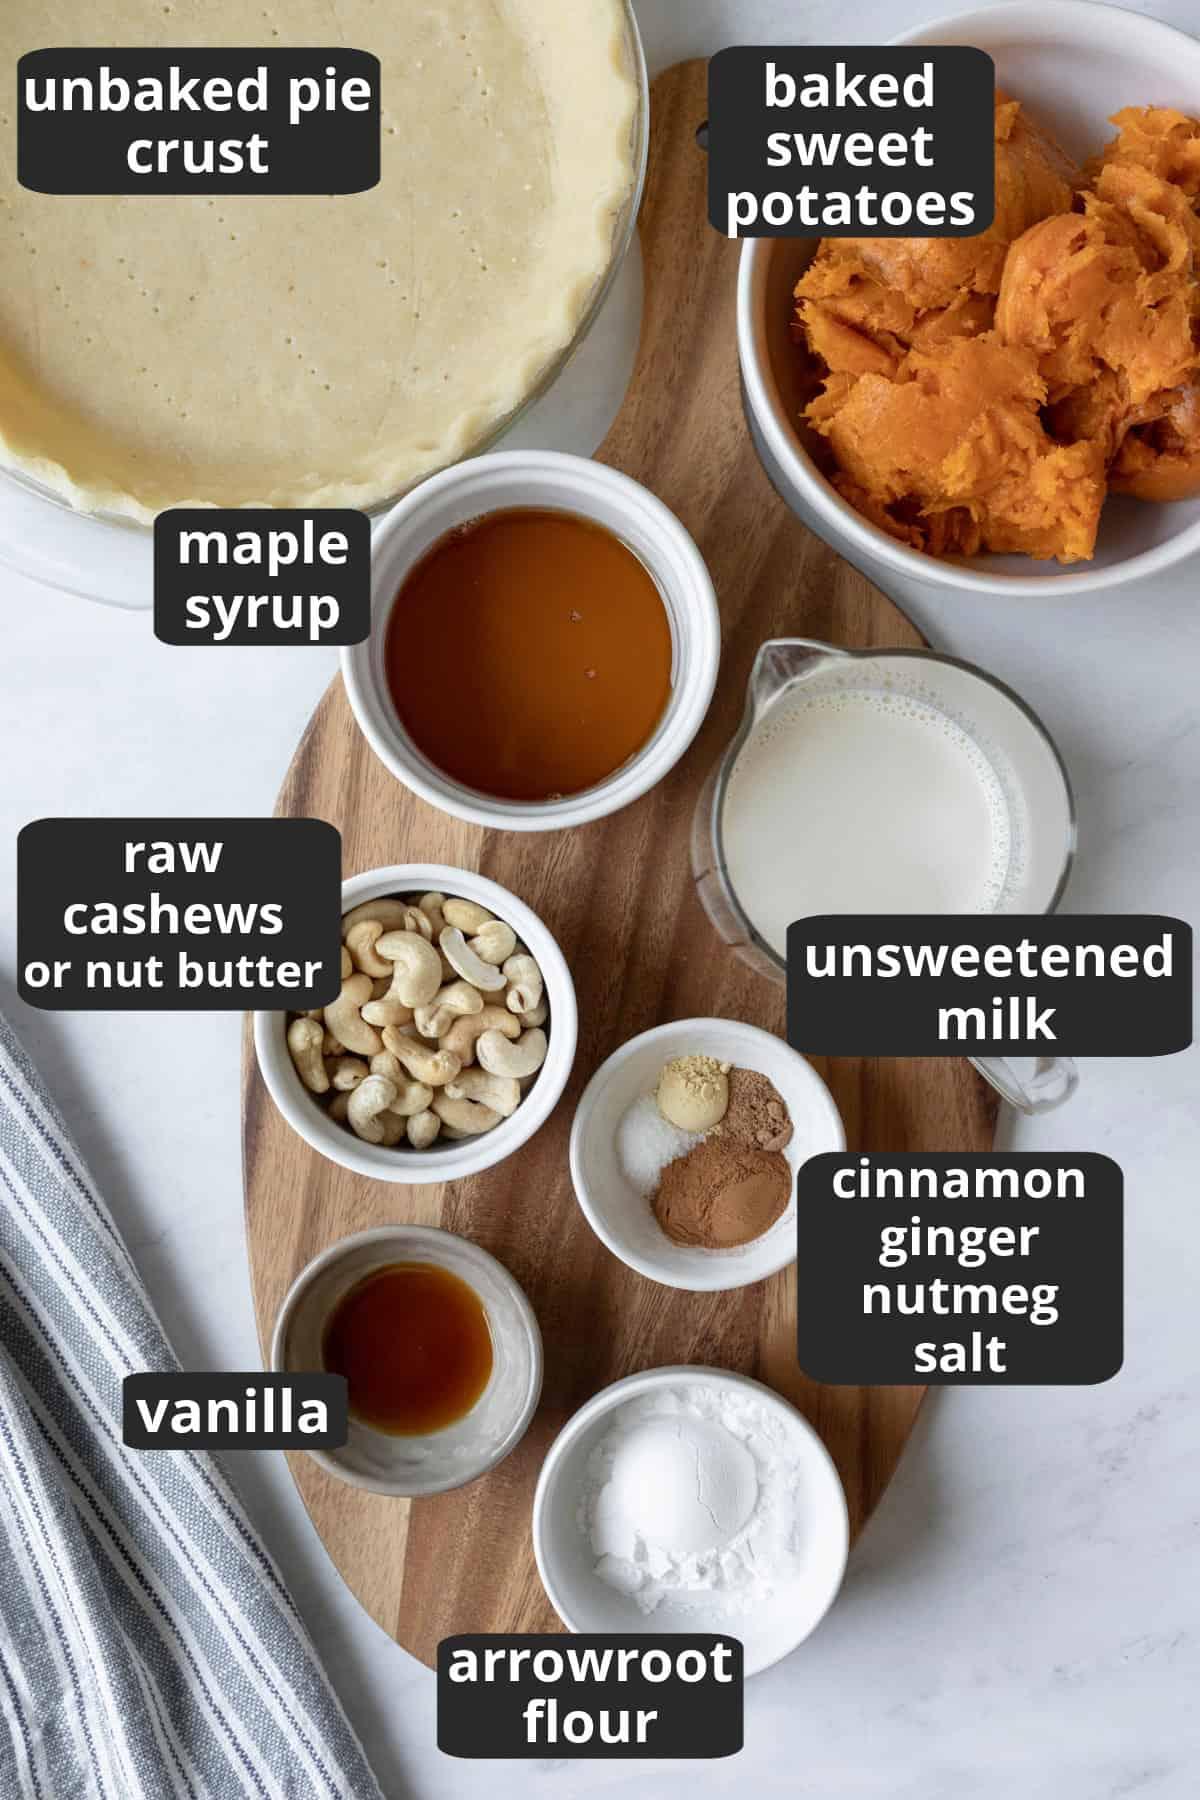 labeled photo of the 11 ingredients needed to make vegan sweet potato pie.